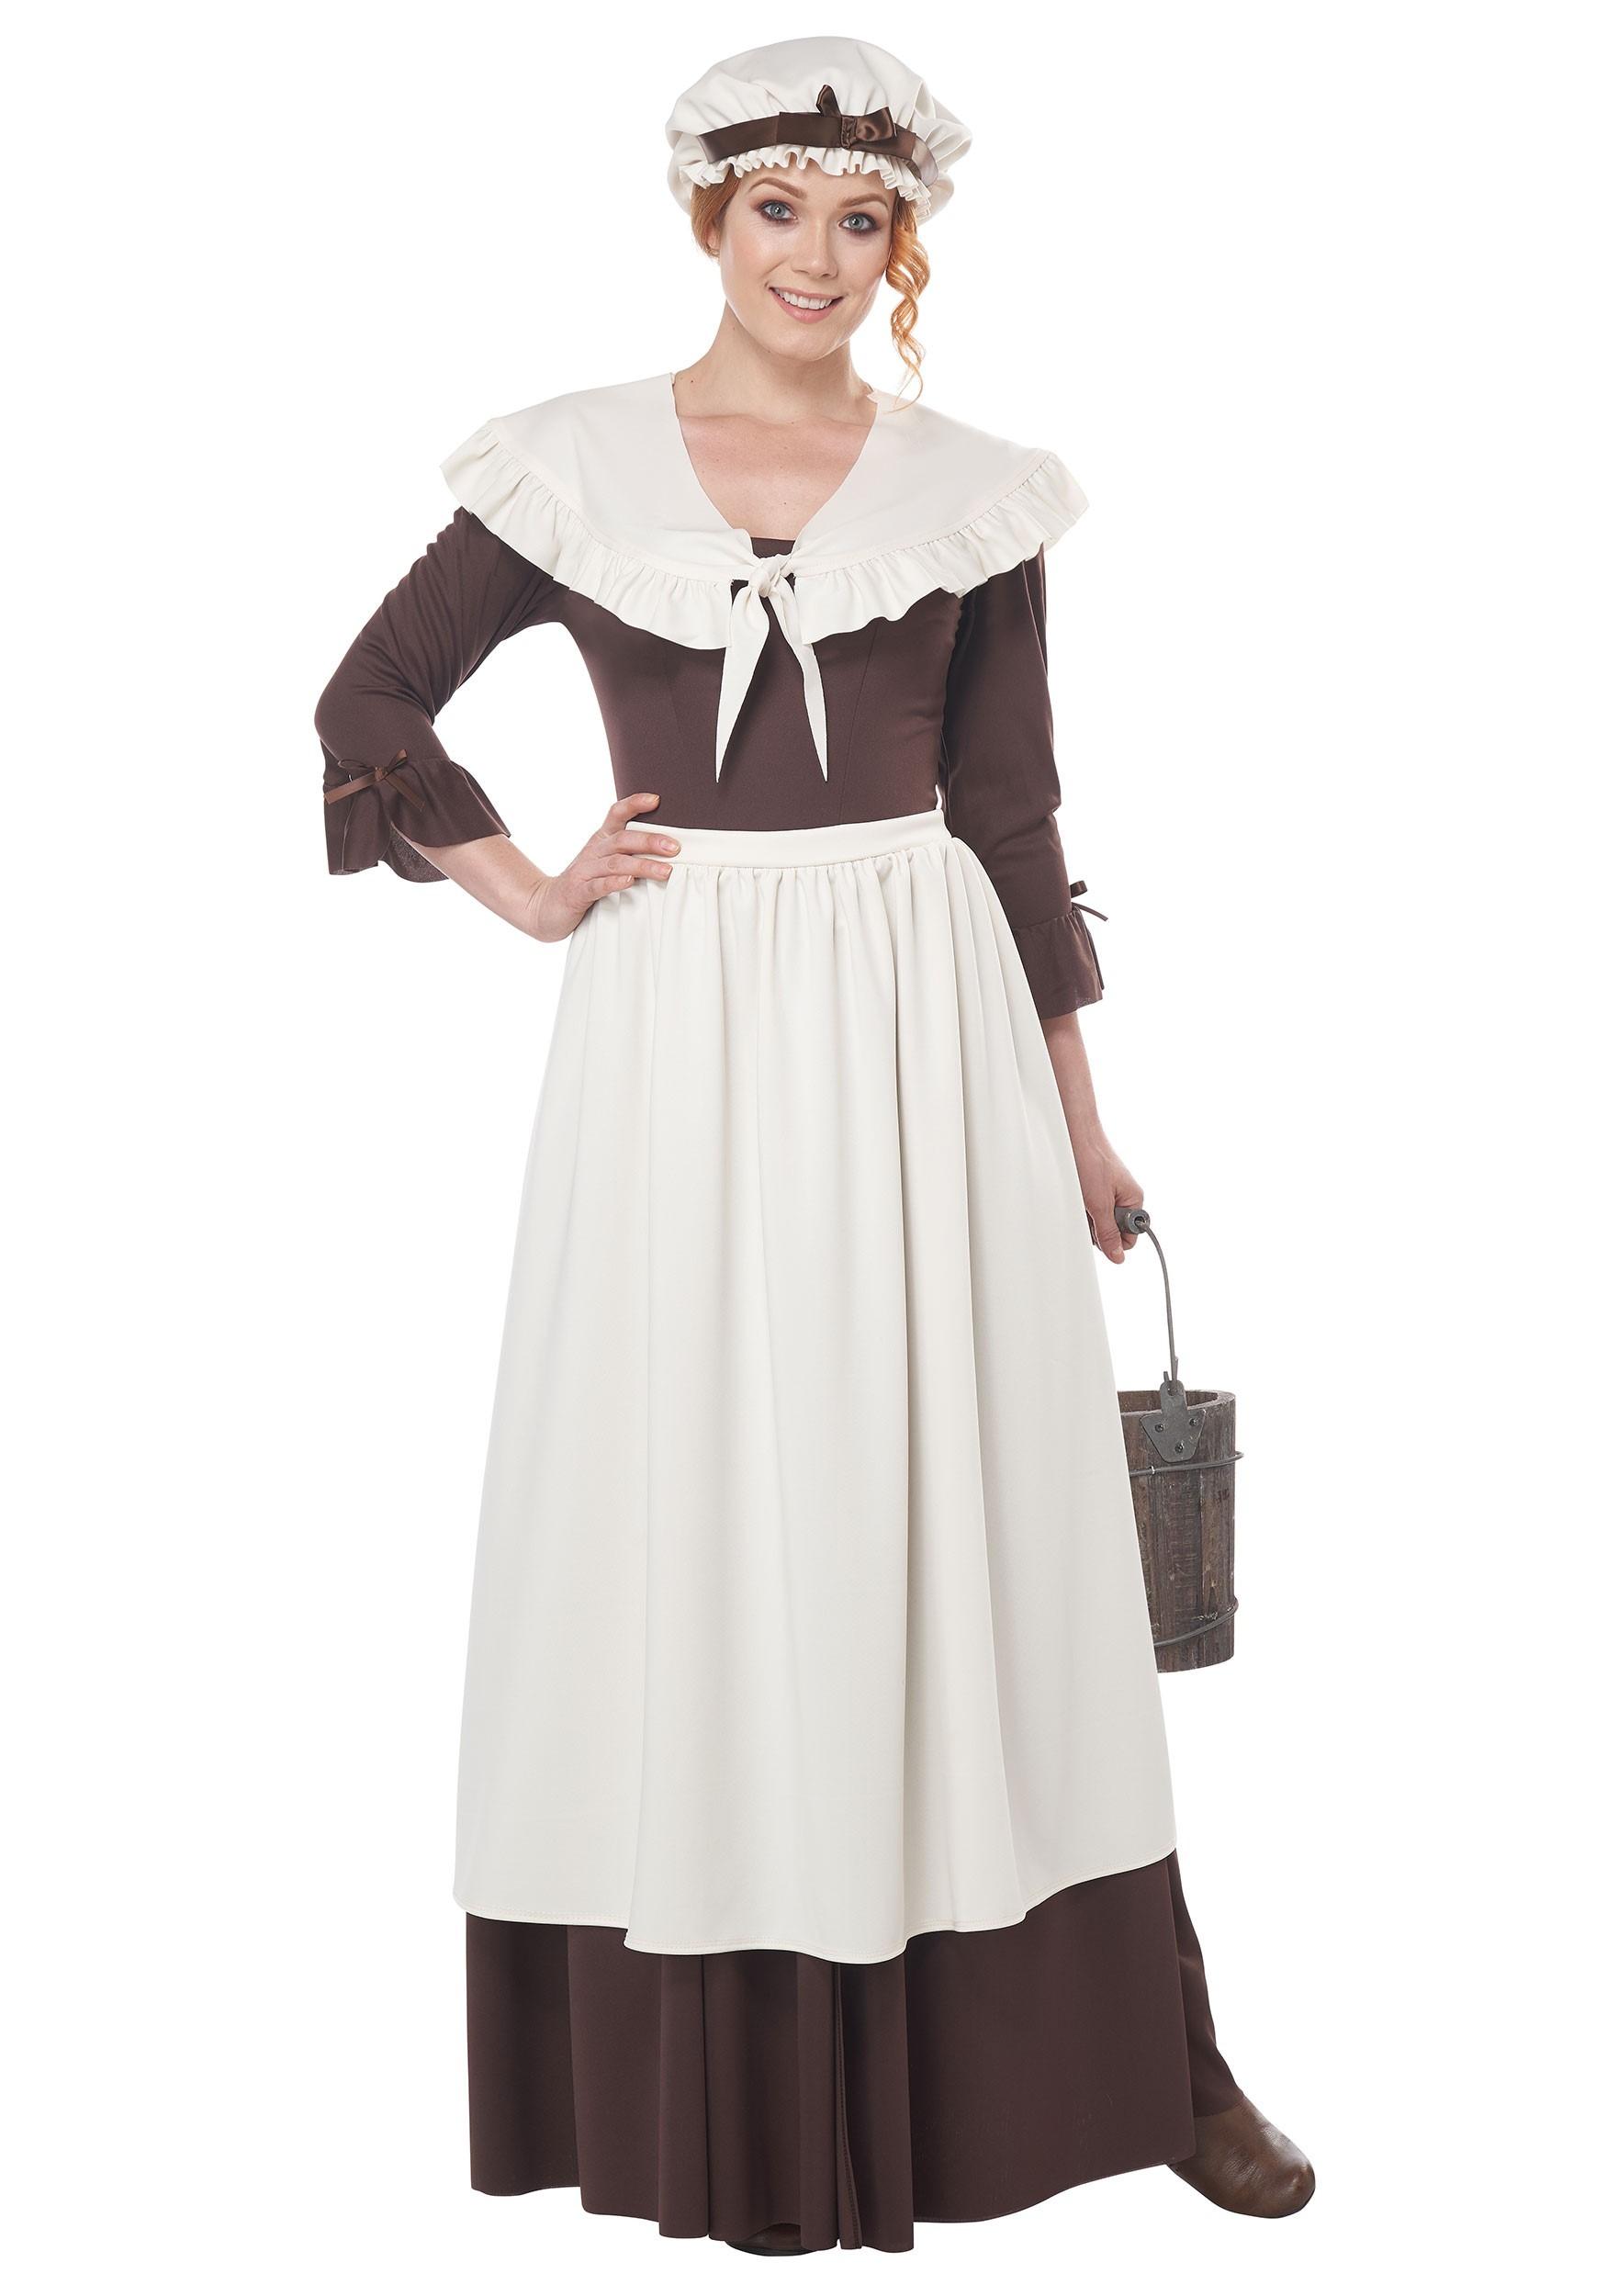 Women's Colonial Village Costume